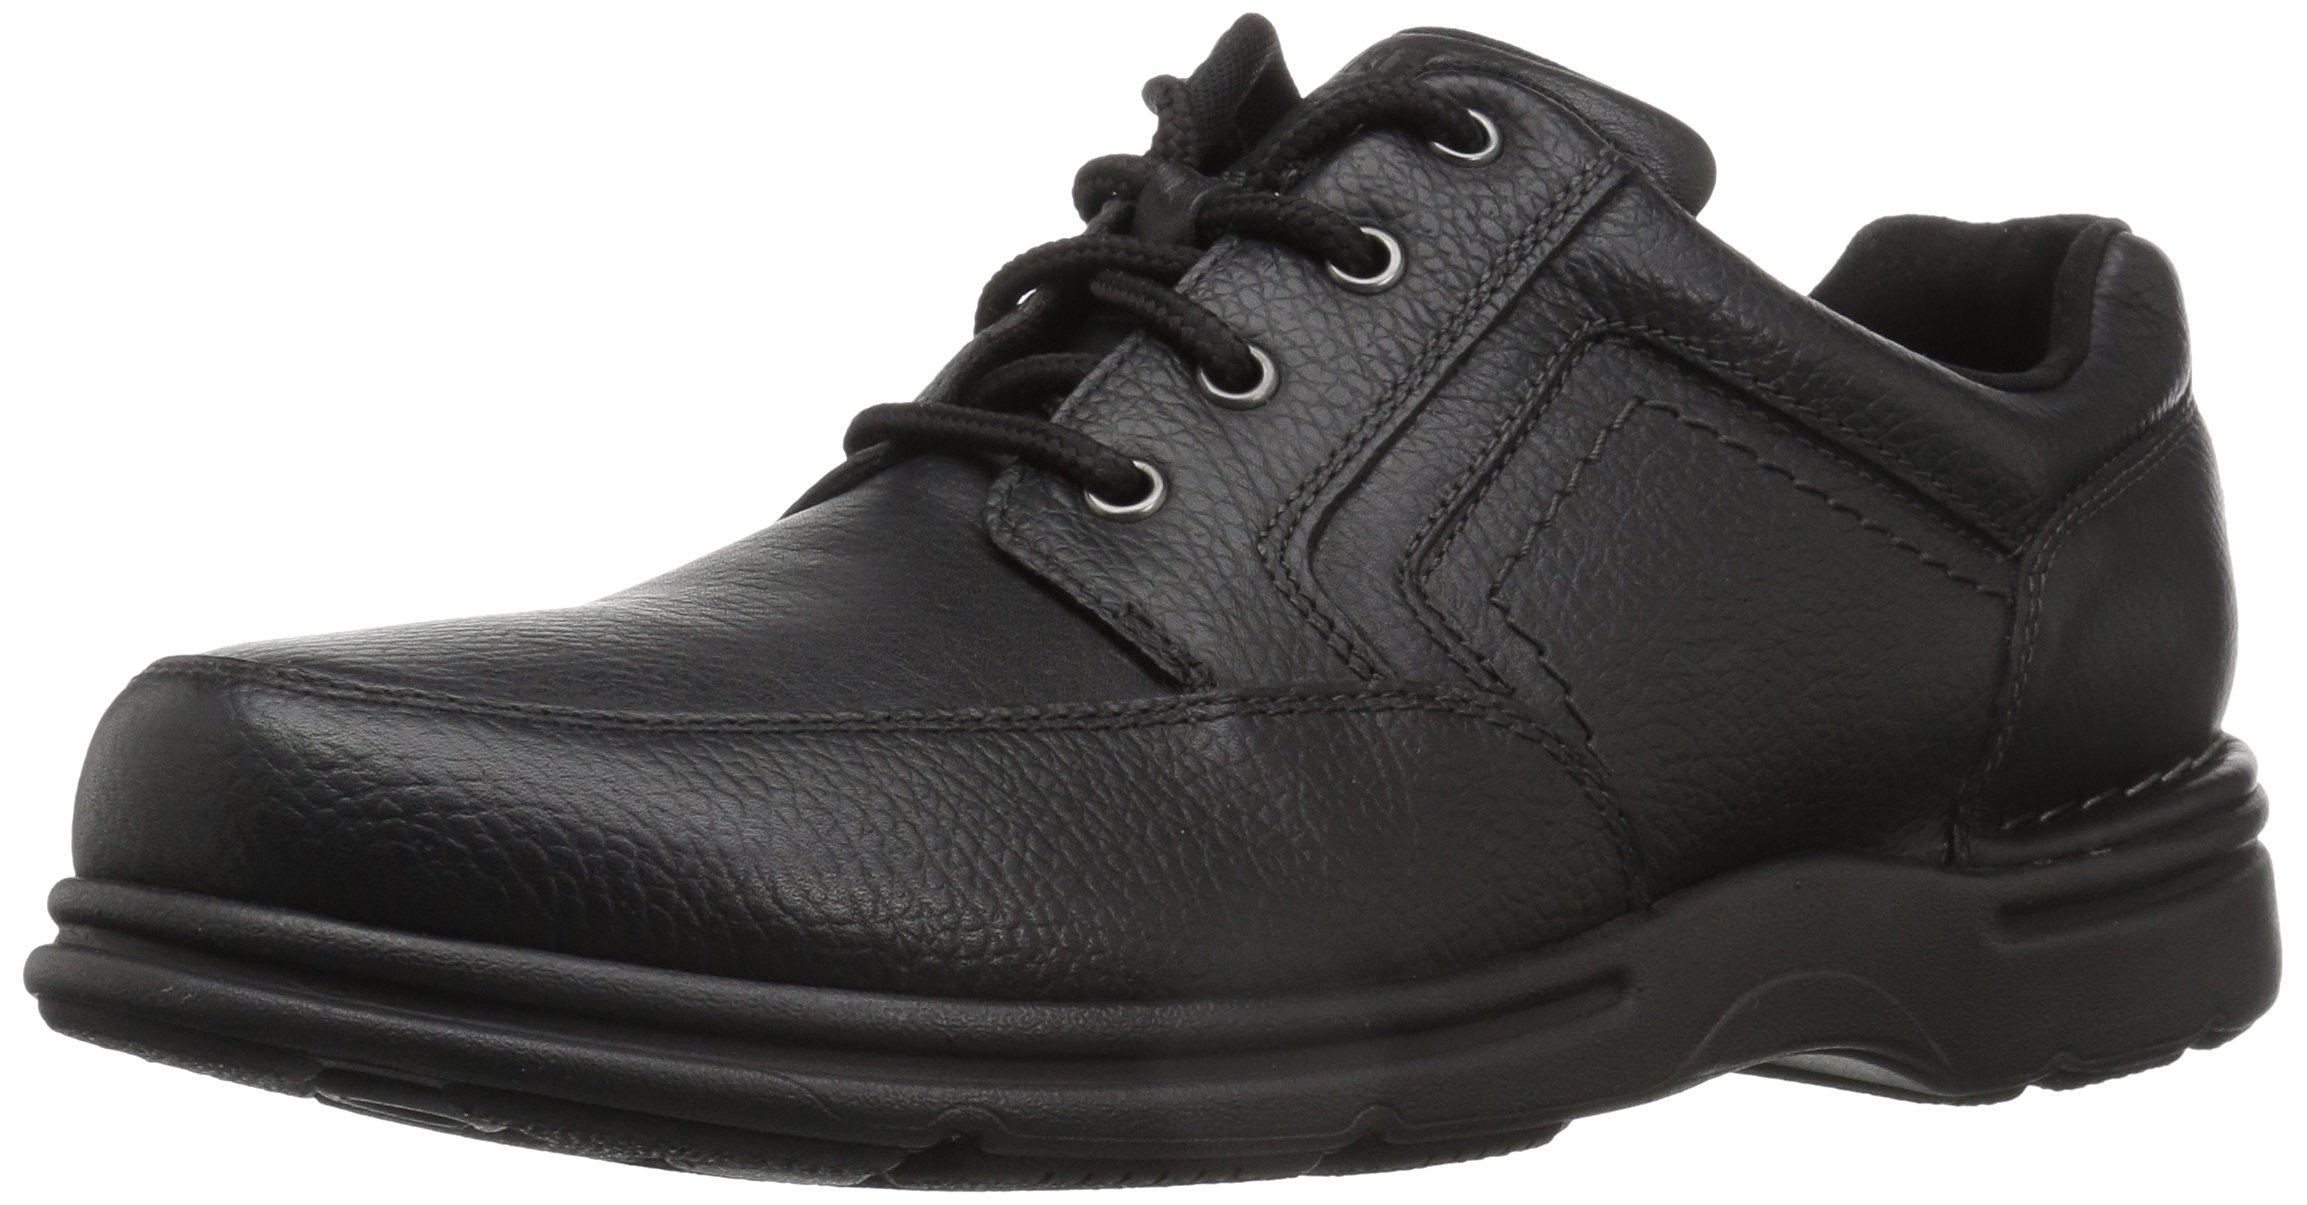 Rockport Men's Eureka Plus Mudguard Oxford, Black, 10 M US